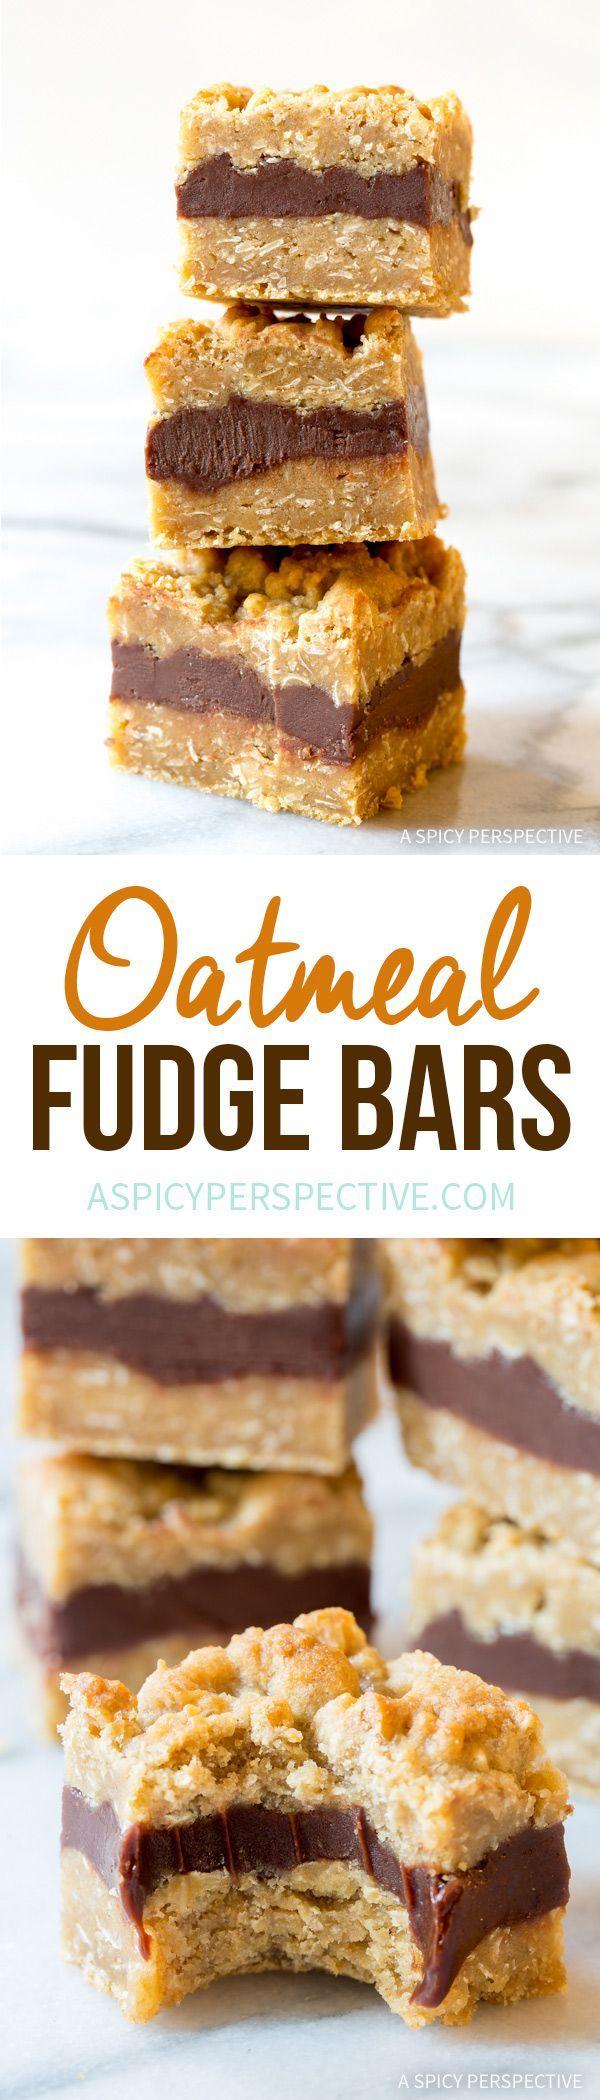 Oatmeal Fudge Bars Recipe | http://ASpicyPerspective.com